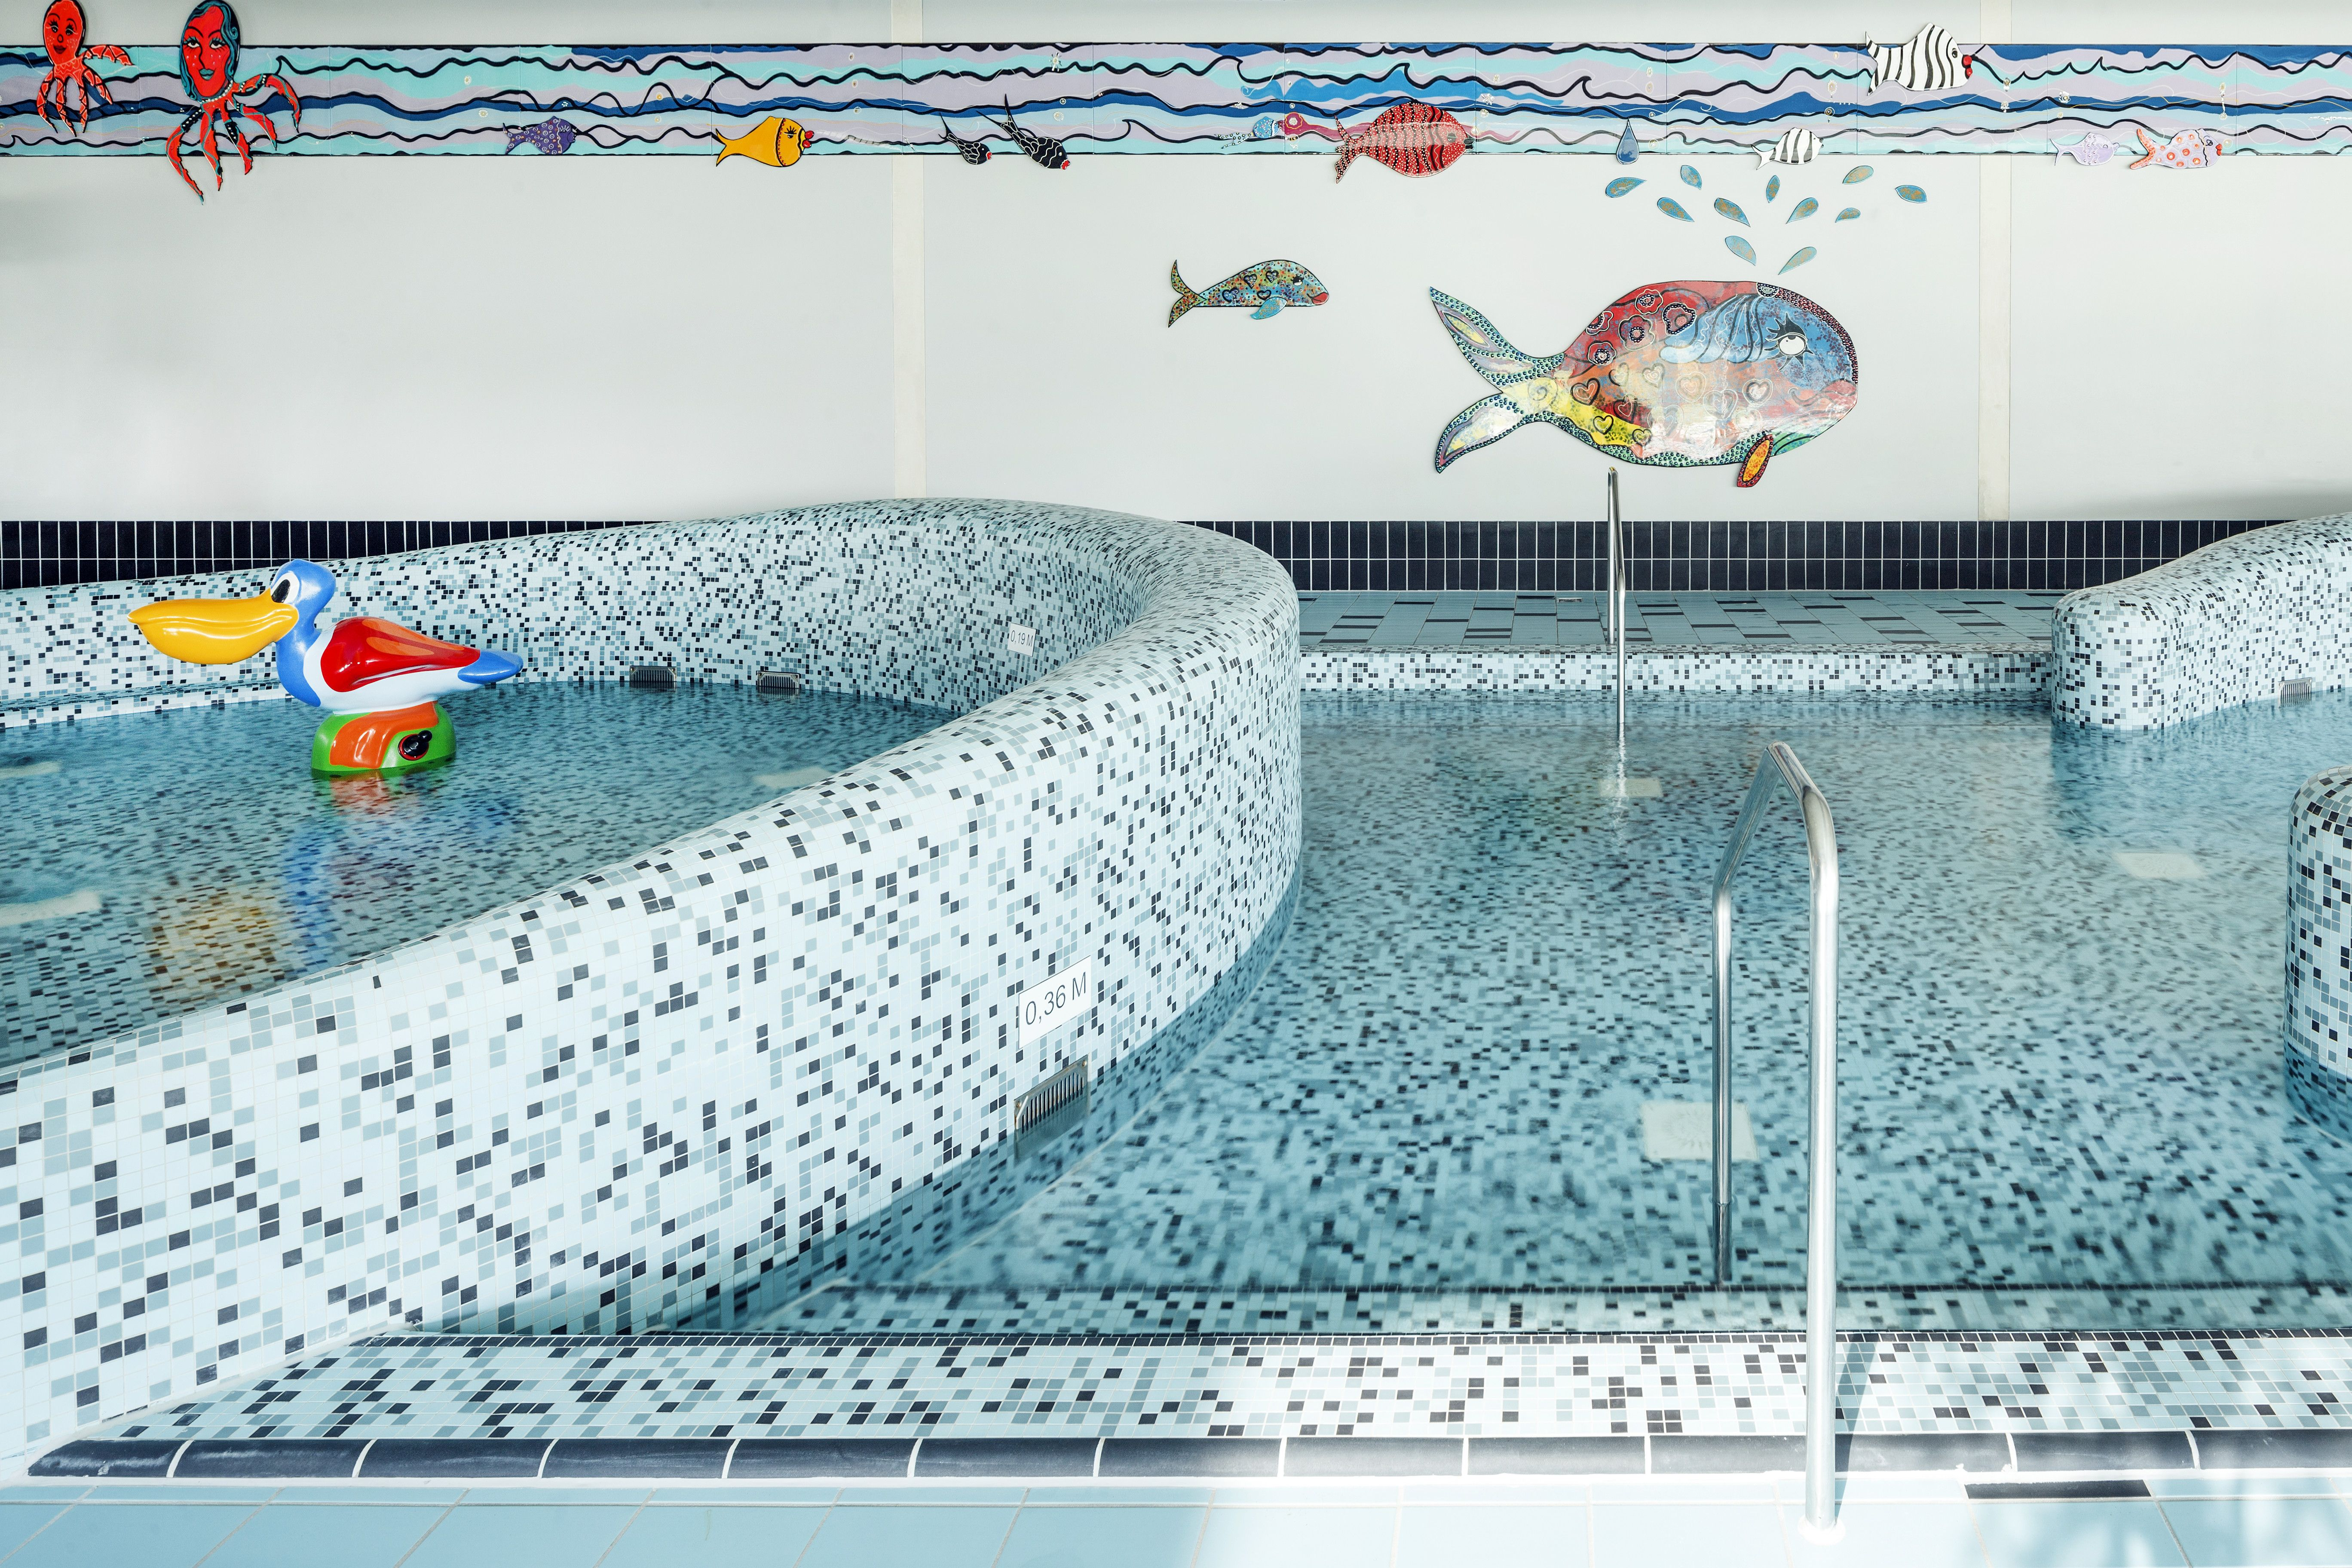 Kinderbad Zwembad Olympia Waalwijk Projecten Olympia Zwembad